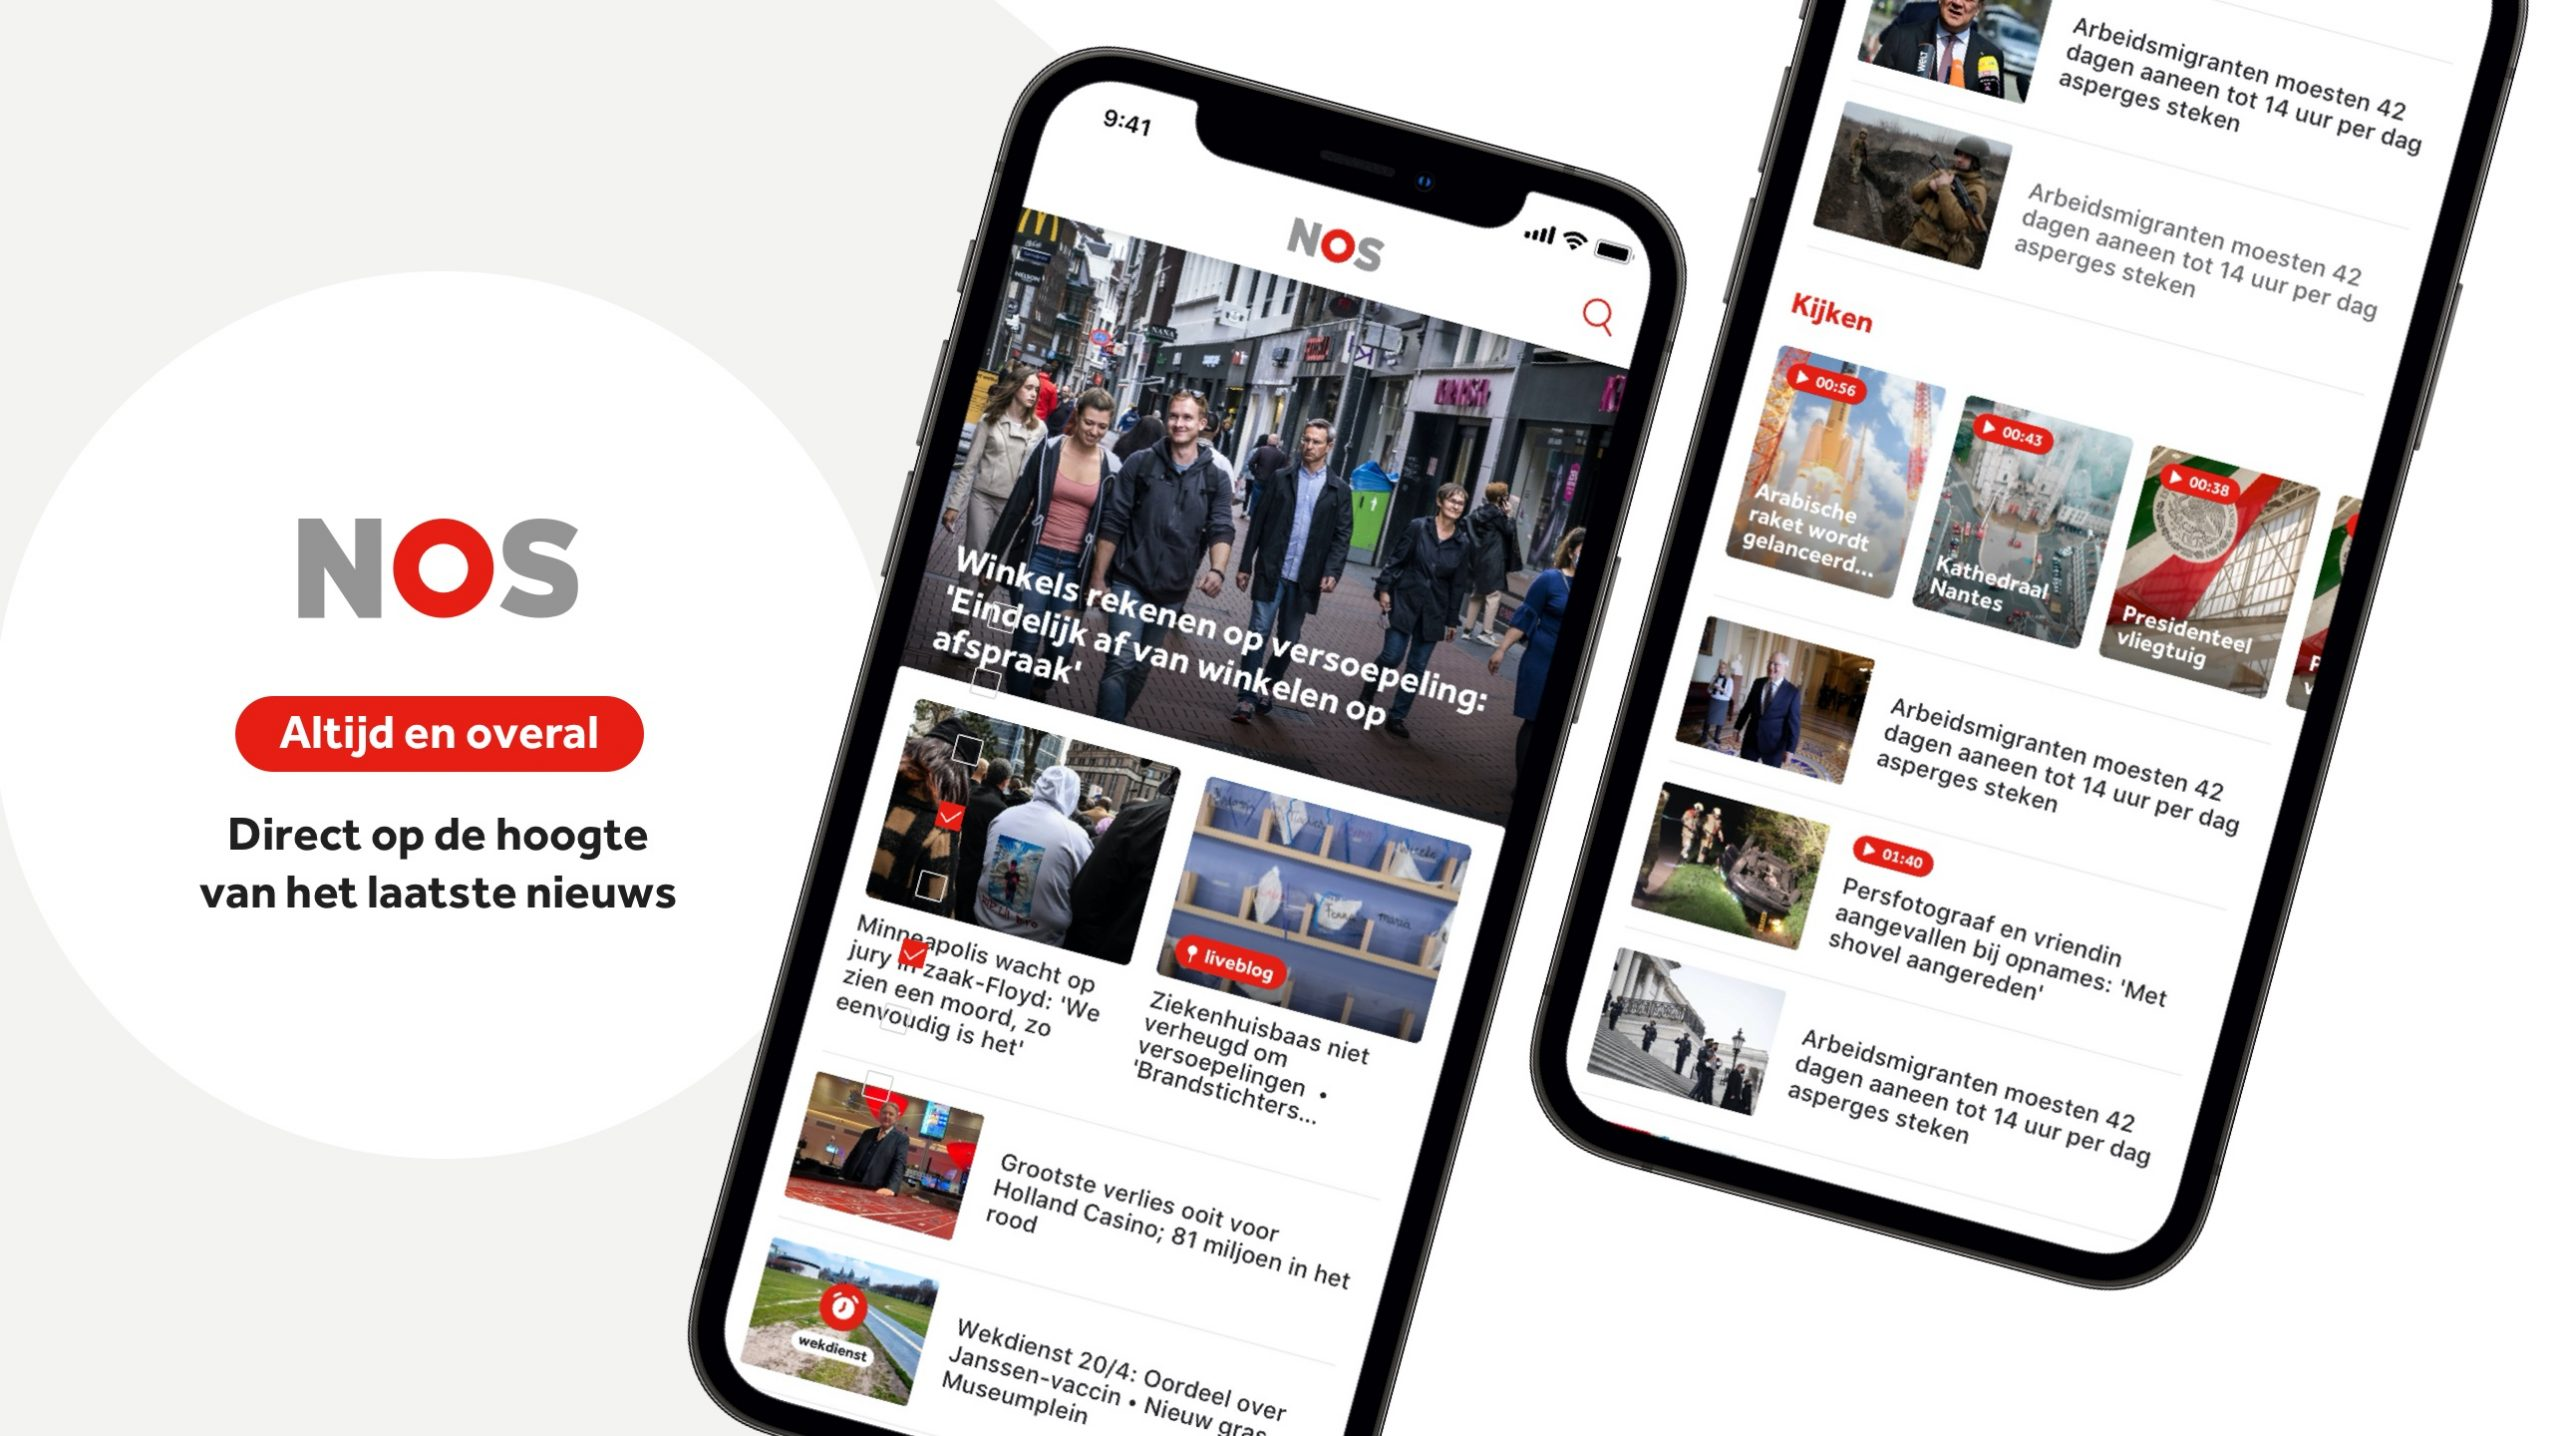 NOS.nl en de NOS-app vernieuwd